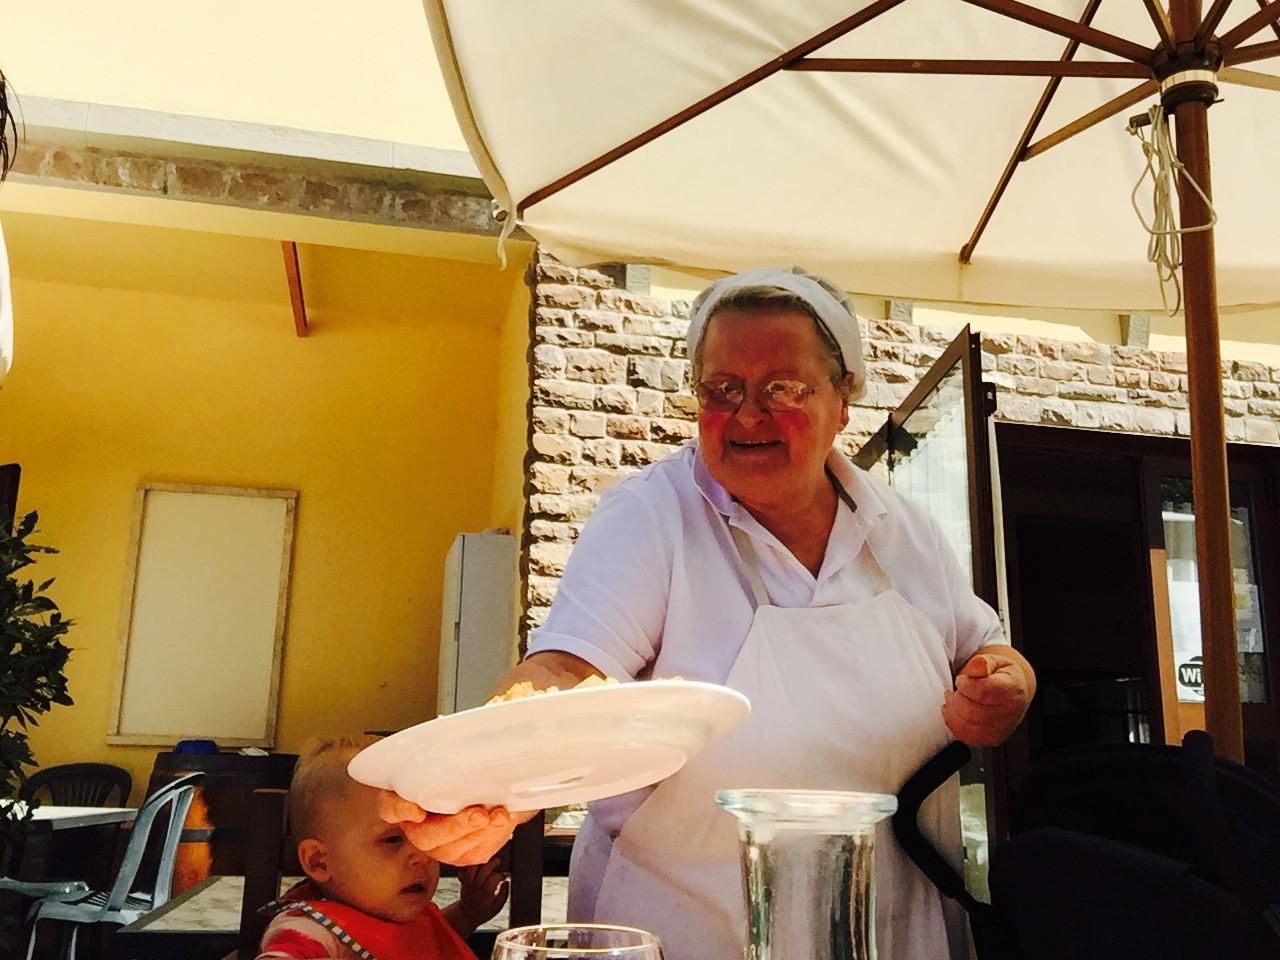 Lunchen bij Nonna in Toscane ervaring in Italië foodblog Foodinista